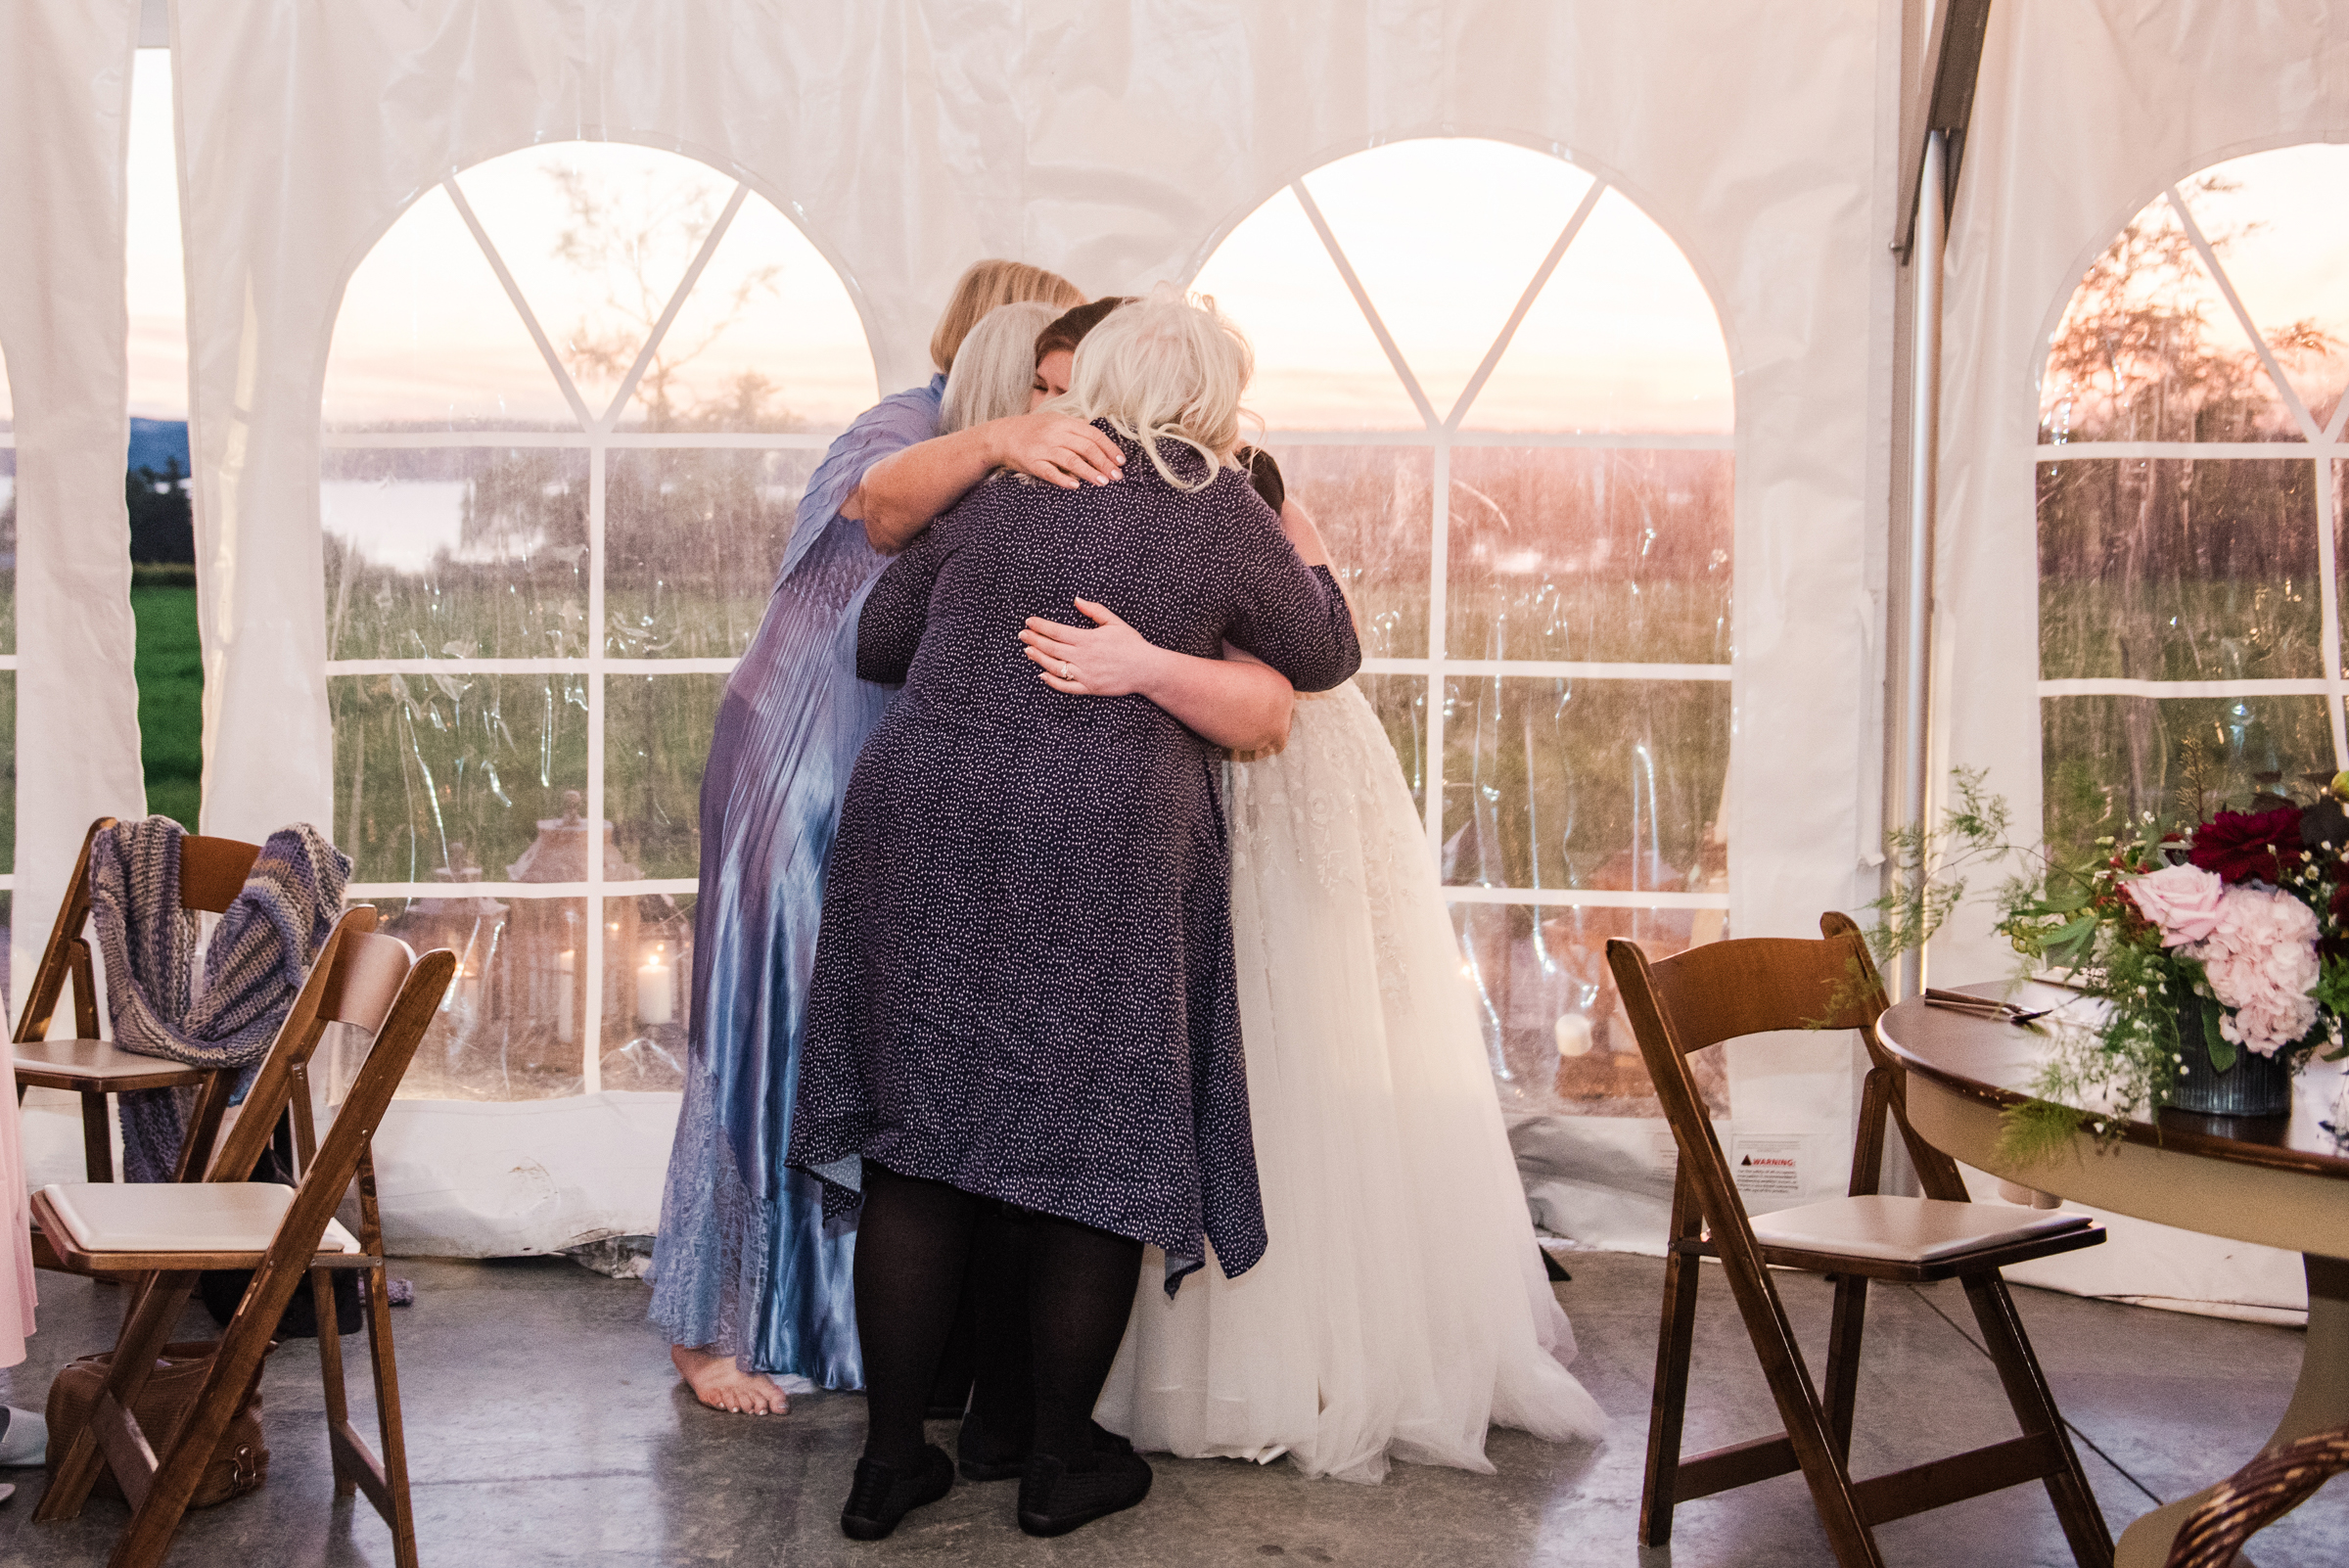 Zugibe_Vineyards_Finger_Lakes_Wedding_JILL_STUDIO_Rochester_NY_Photographer_DSC_4280.jpg